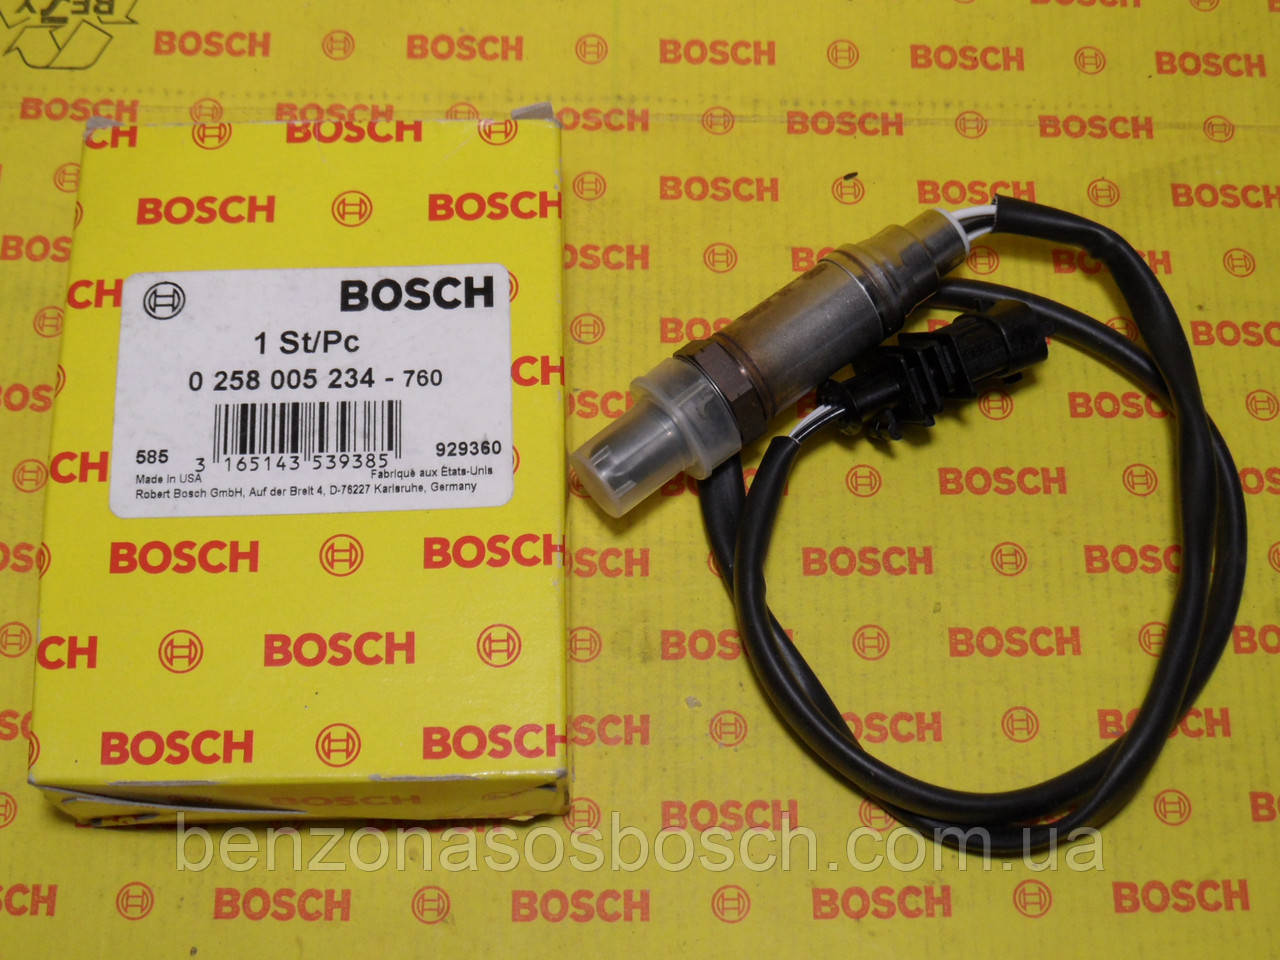 Лямбда-зонд Bosch 0258005234, 0 258 005 234, лямбда-зонд Opel Опель,